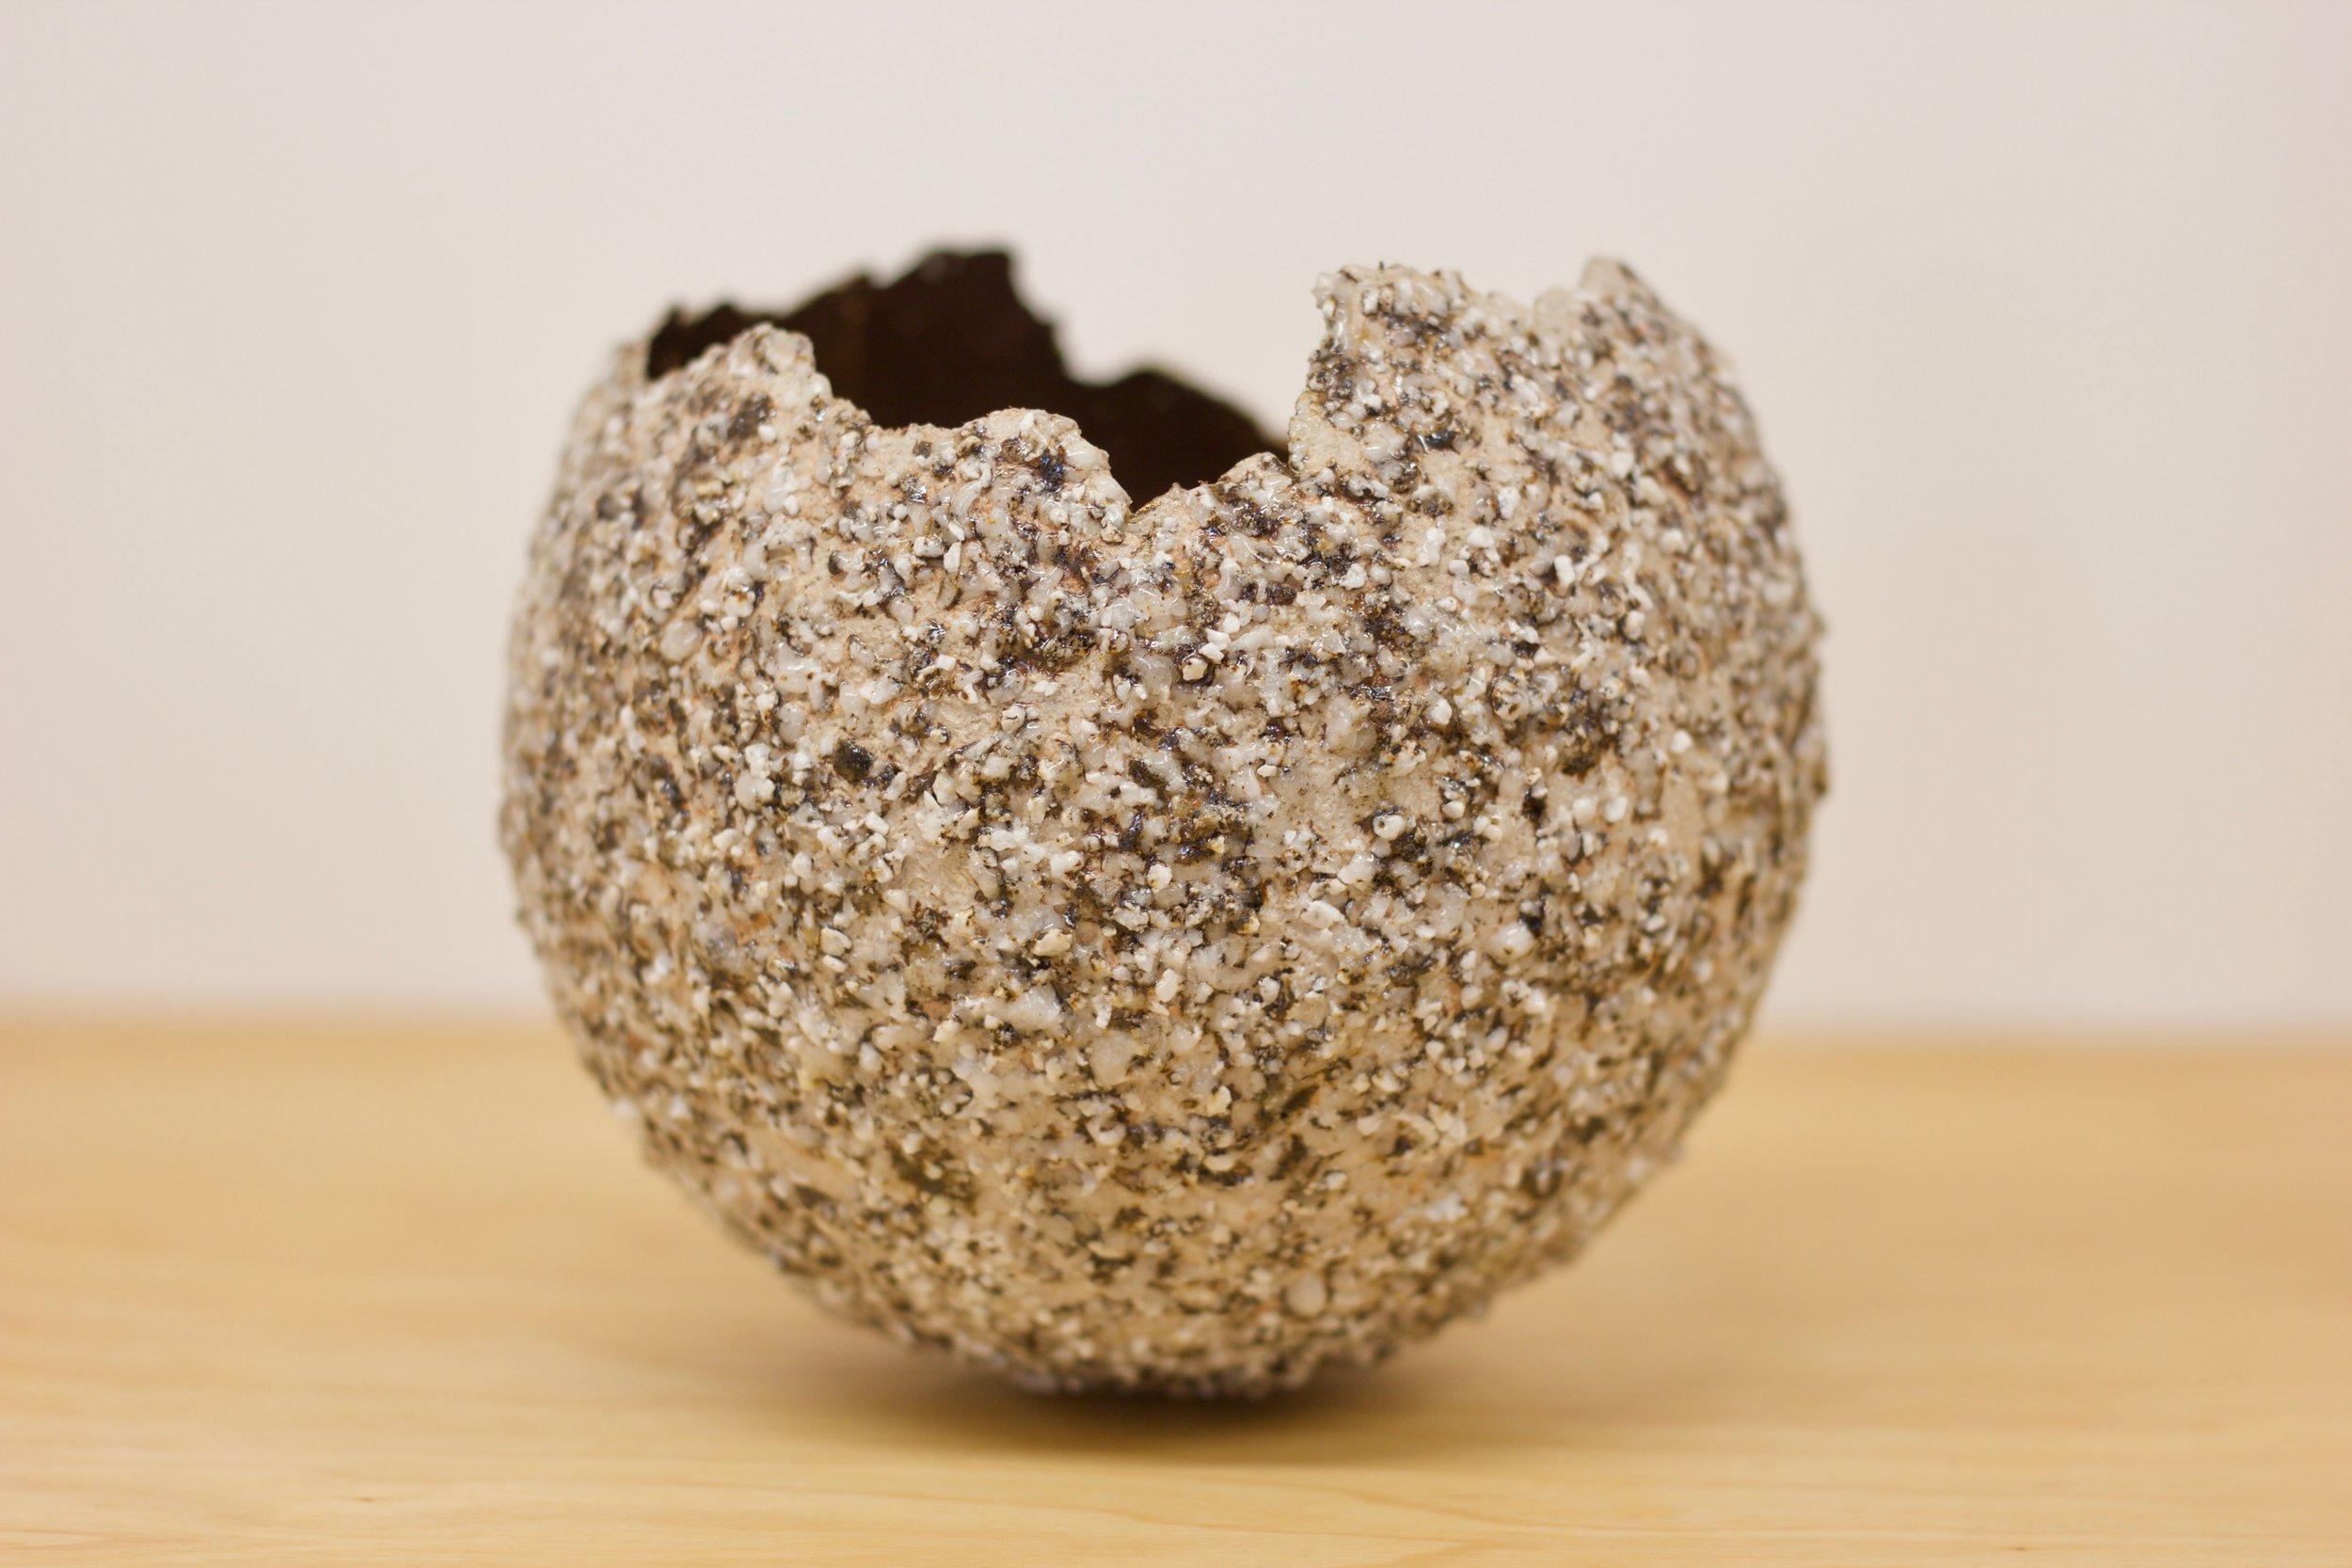 Shap Pink Granite Bronze Leaf Microcosm £155